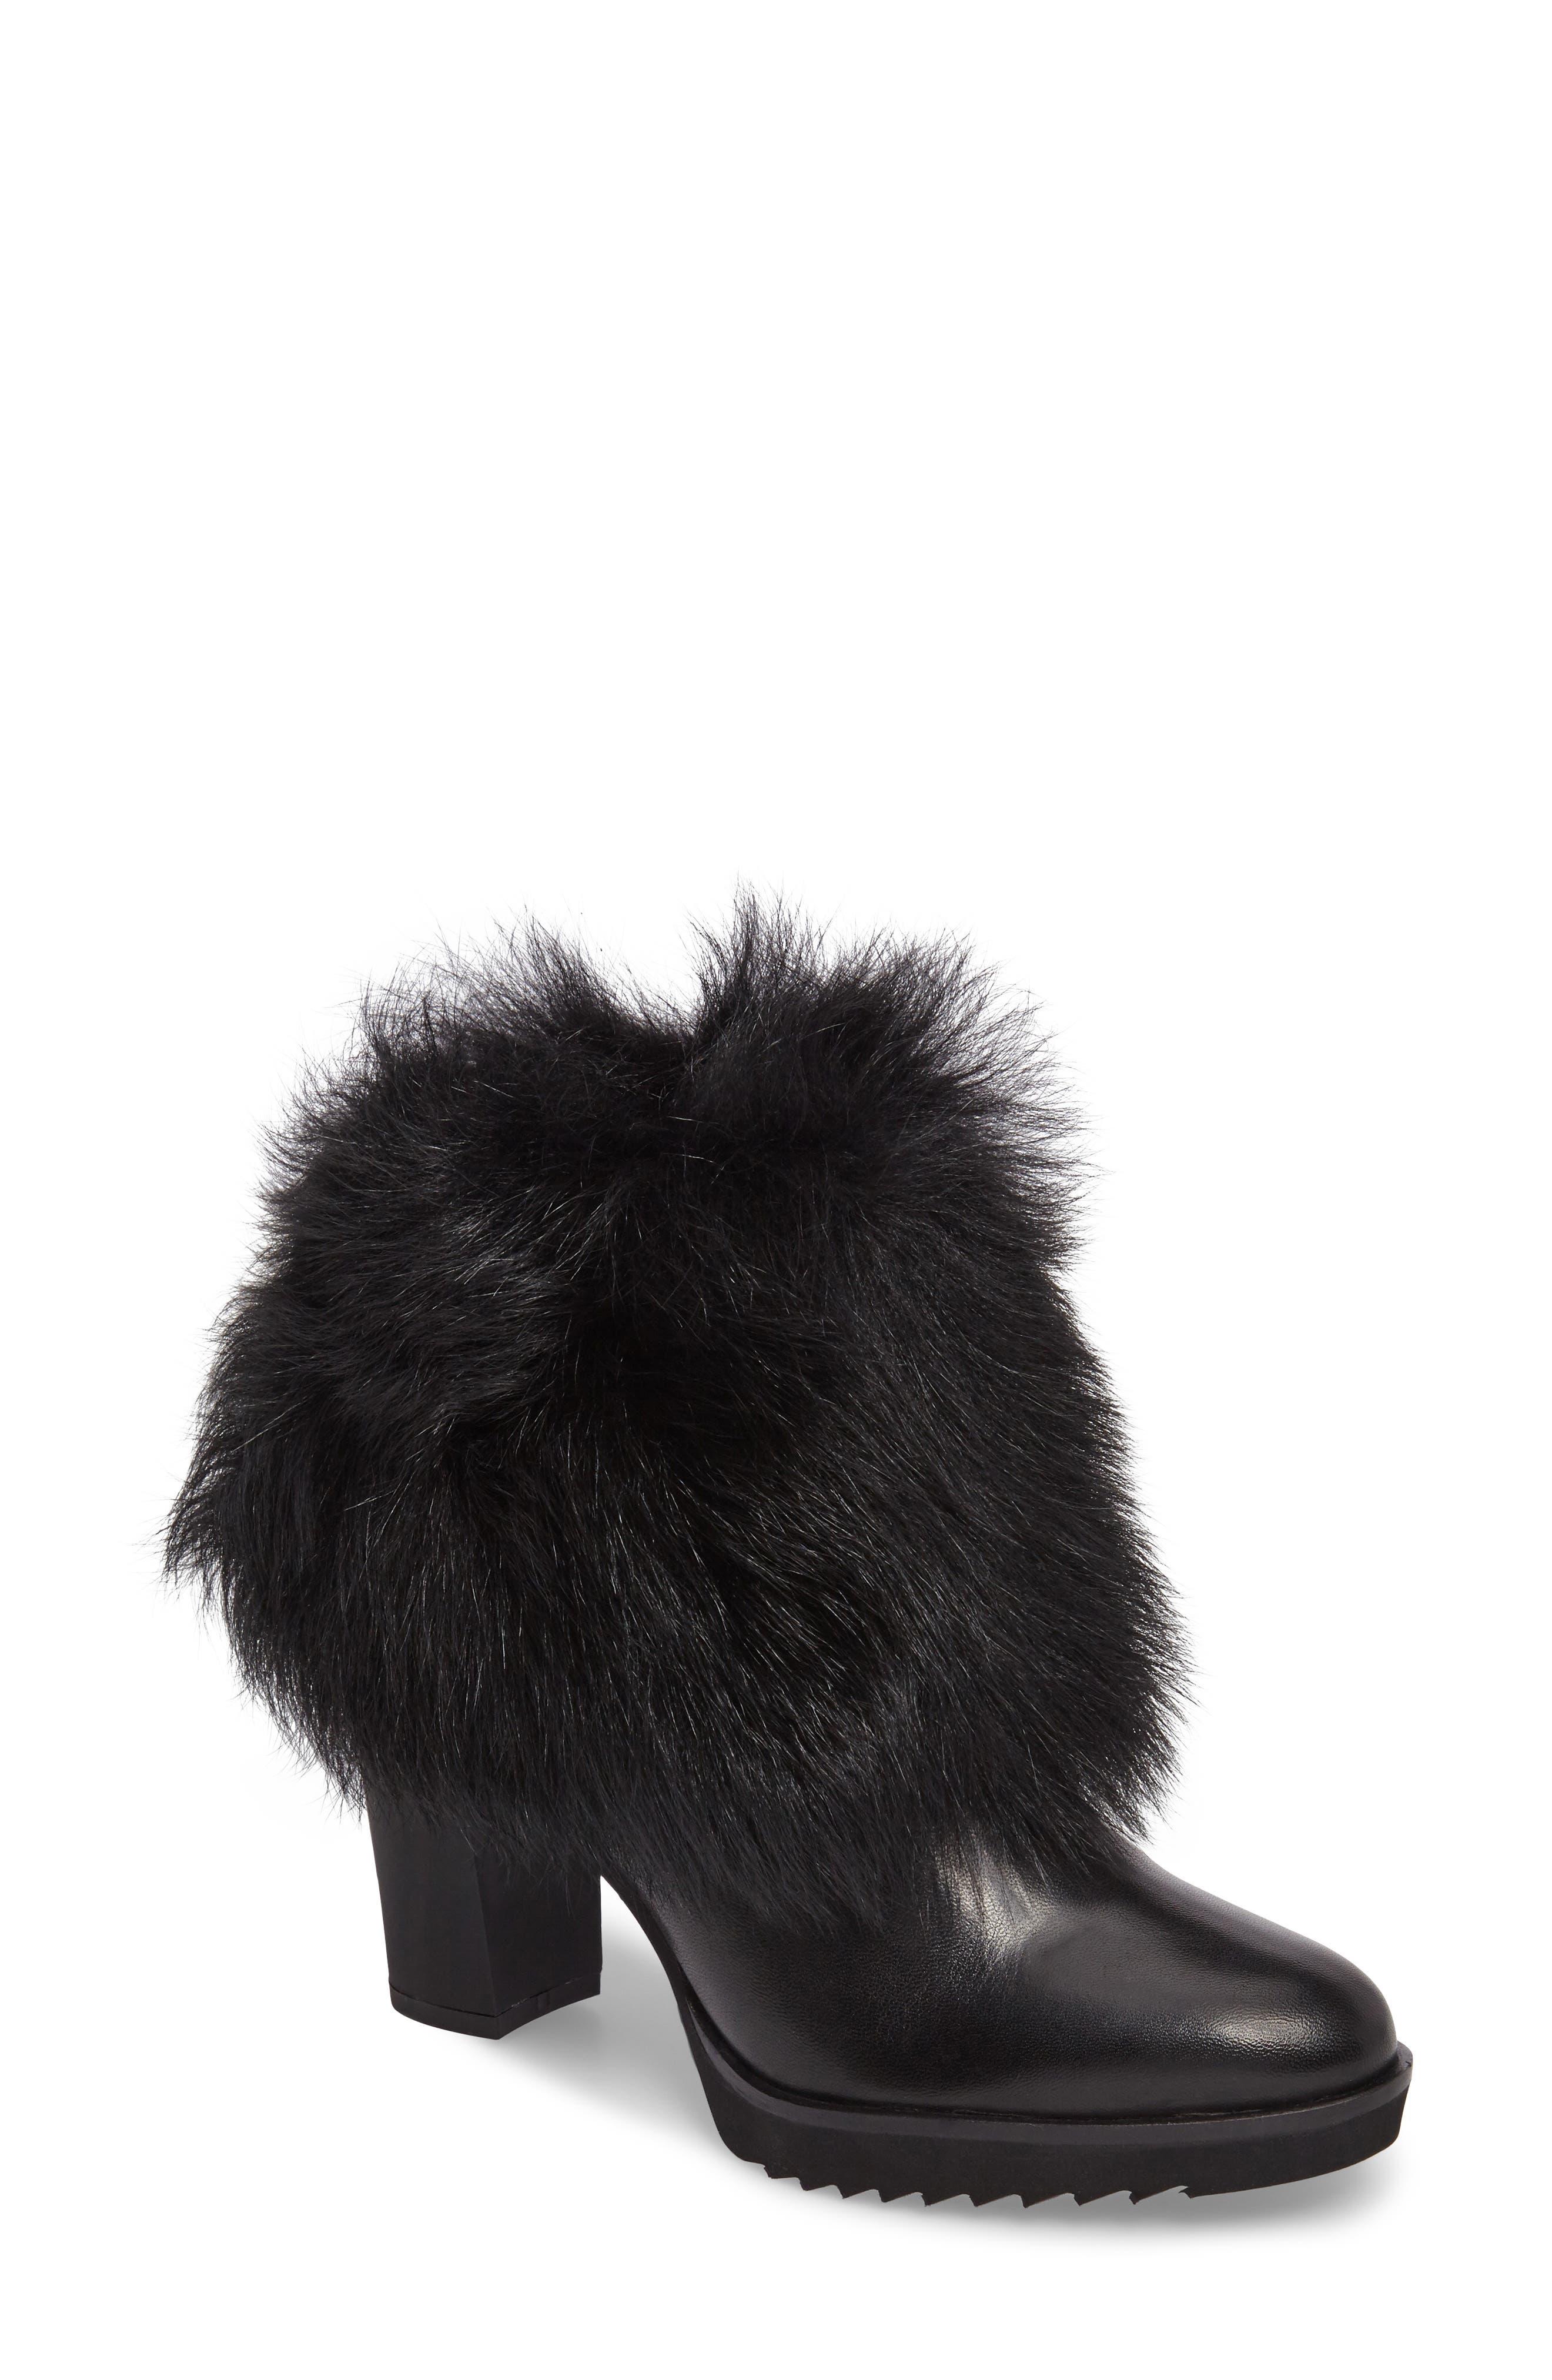 Roslyn Block Heel Genuine Shearling Bootie,                         Main,                         color, Black Leather